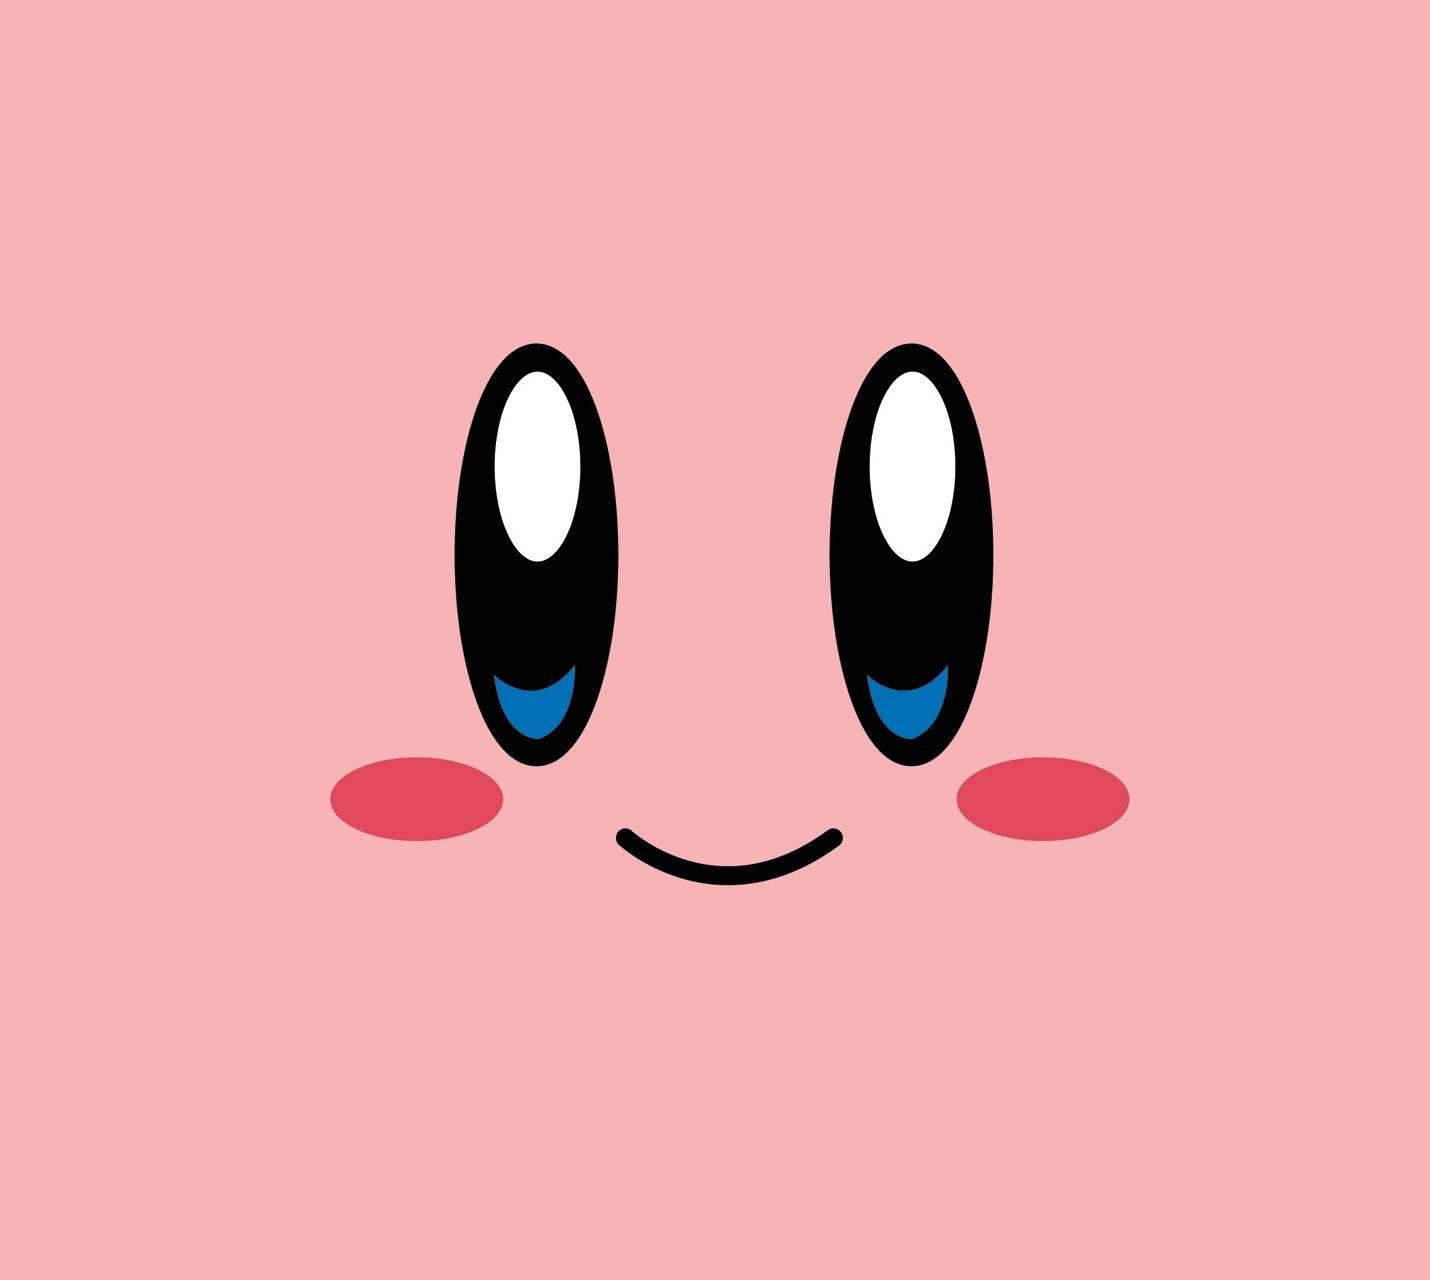 Kirby Face Wallpaper By Cbreezy122112